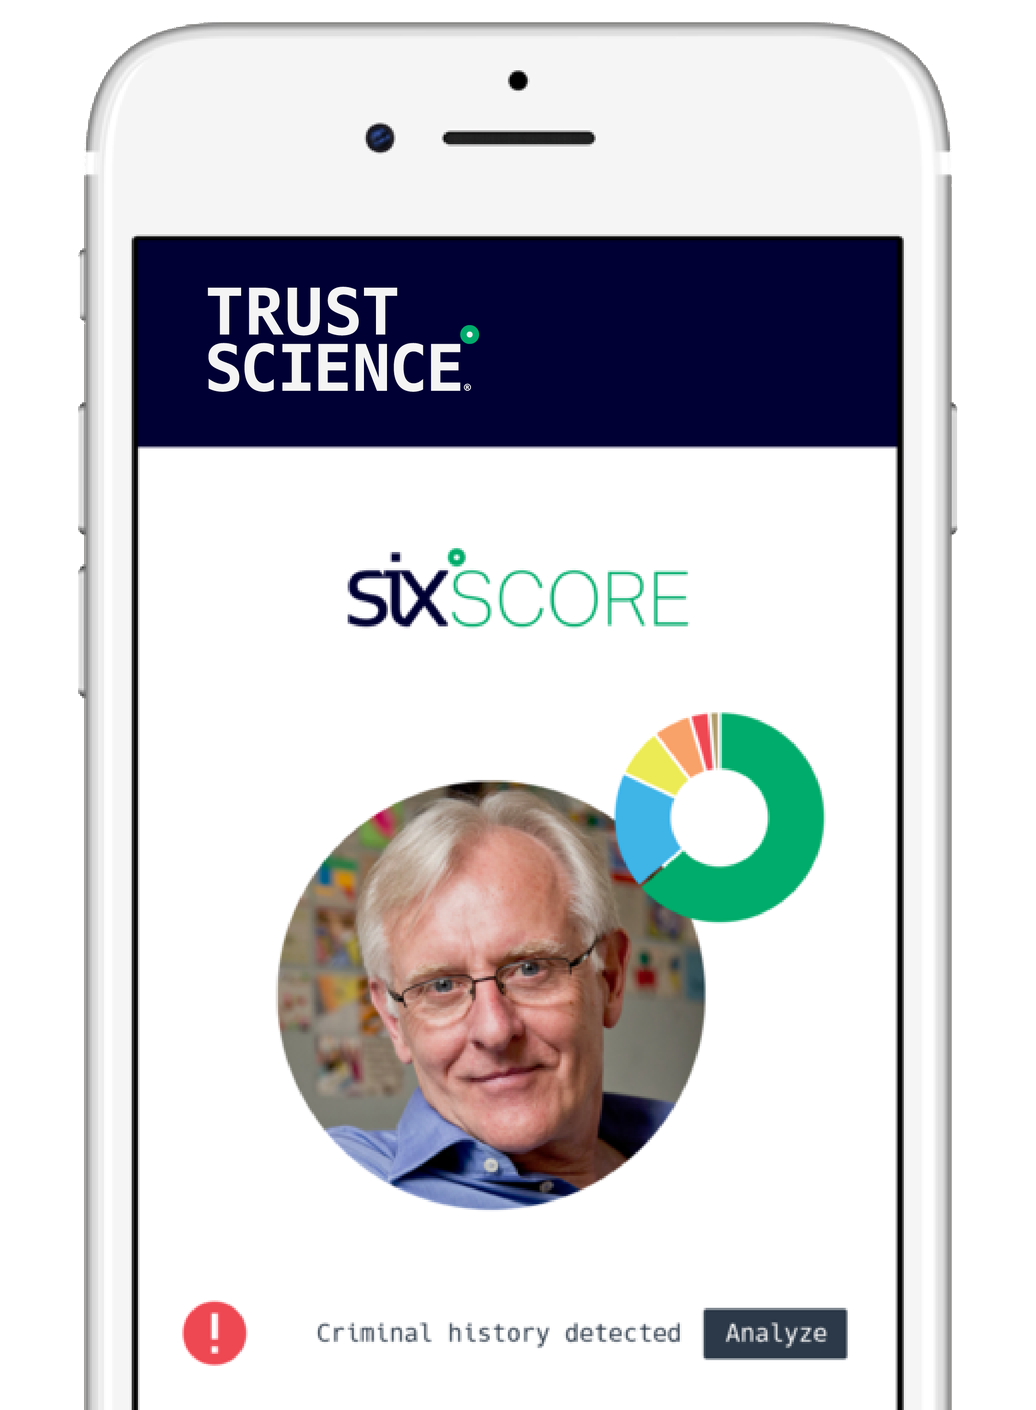 Trust-Science-app.png